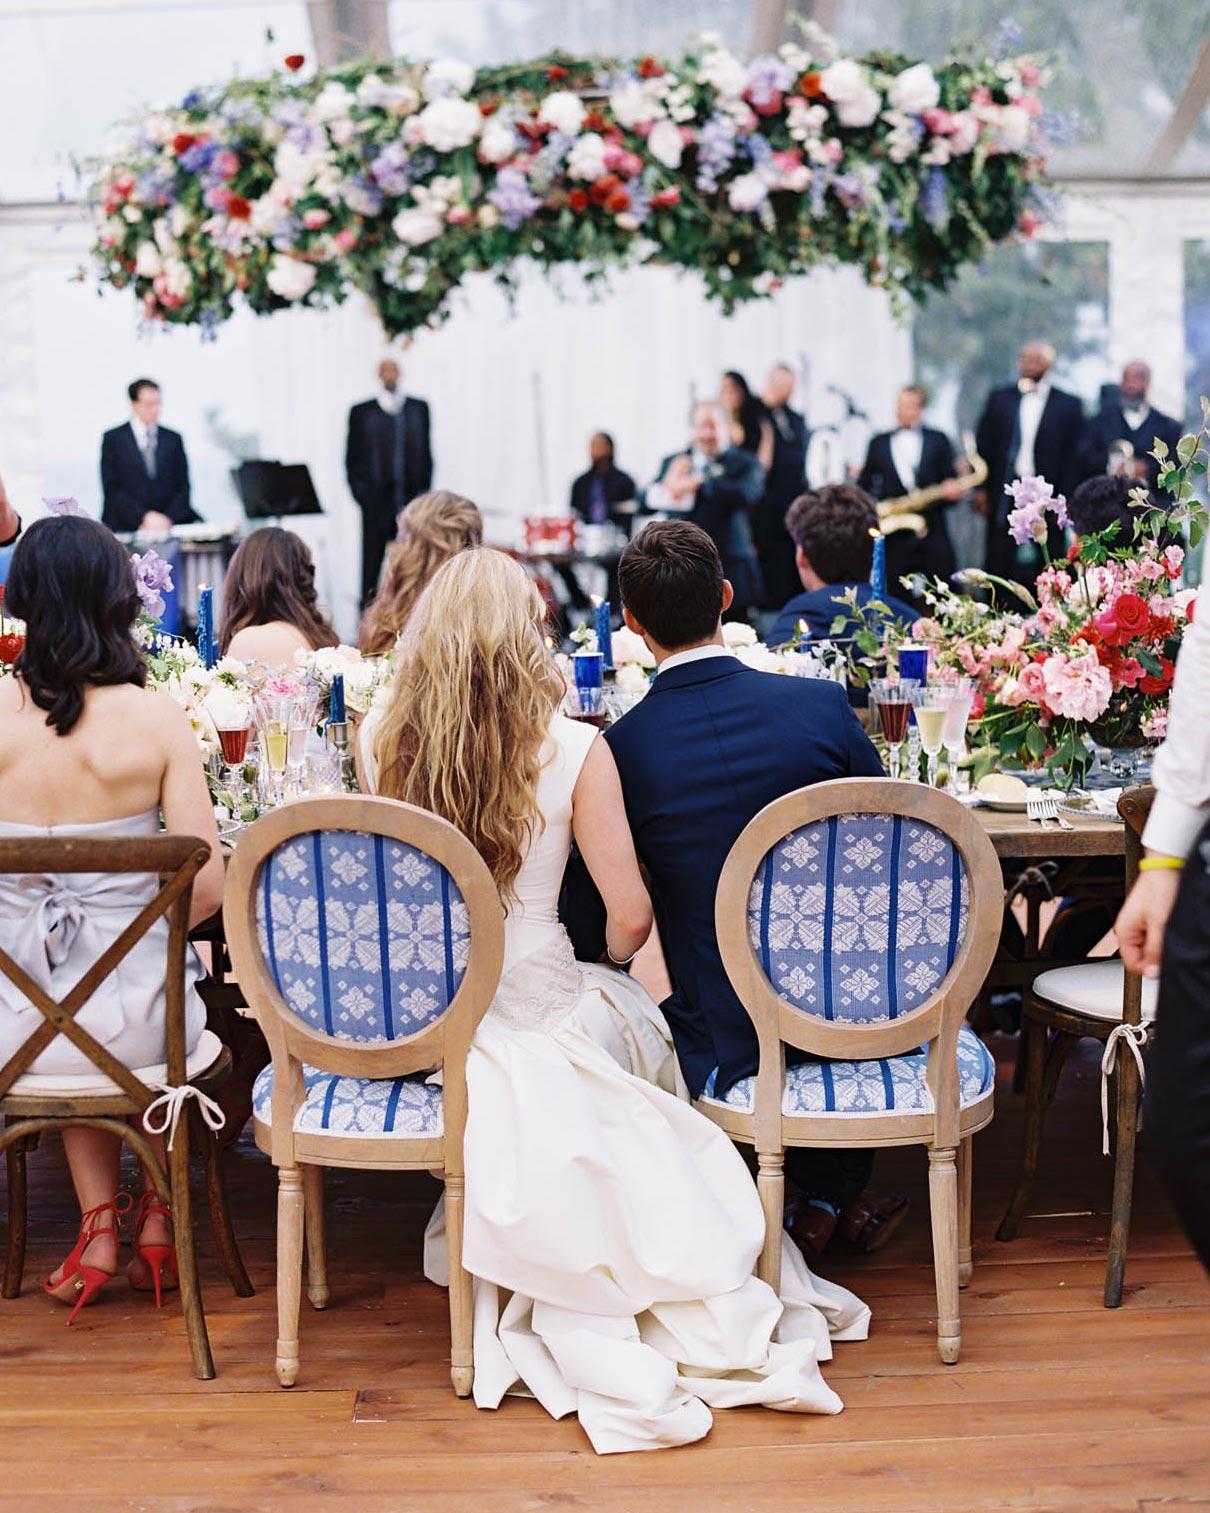 nikki-kiff-wedding-couple-004784002-s112766-0316.jpg